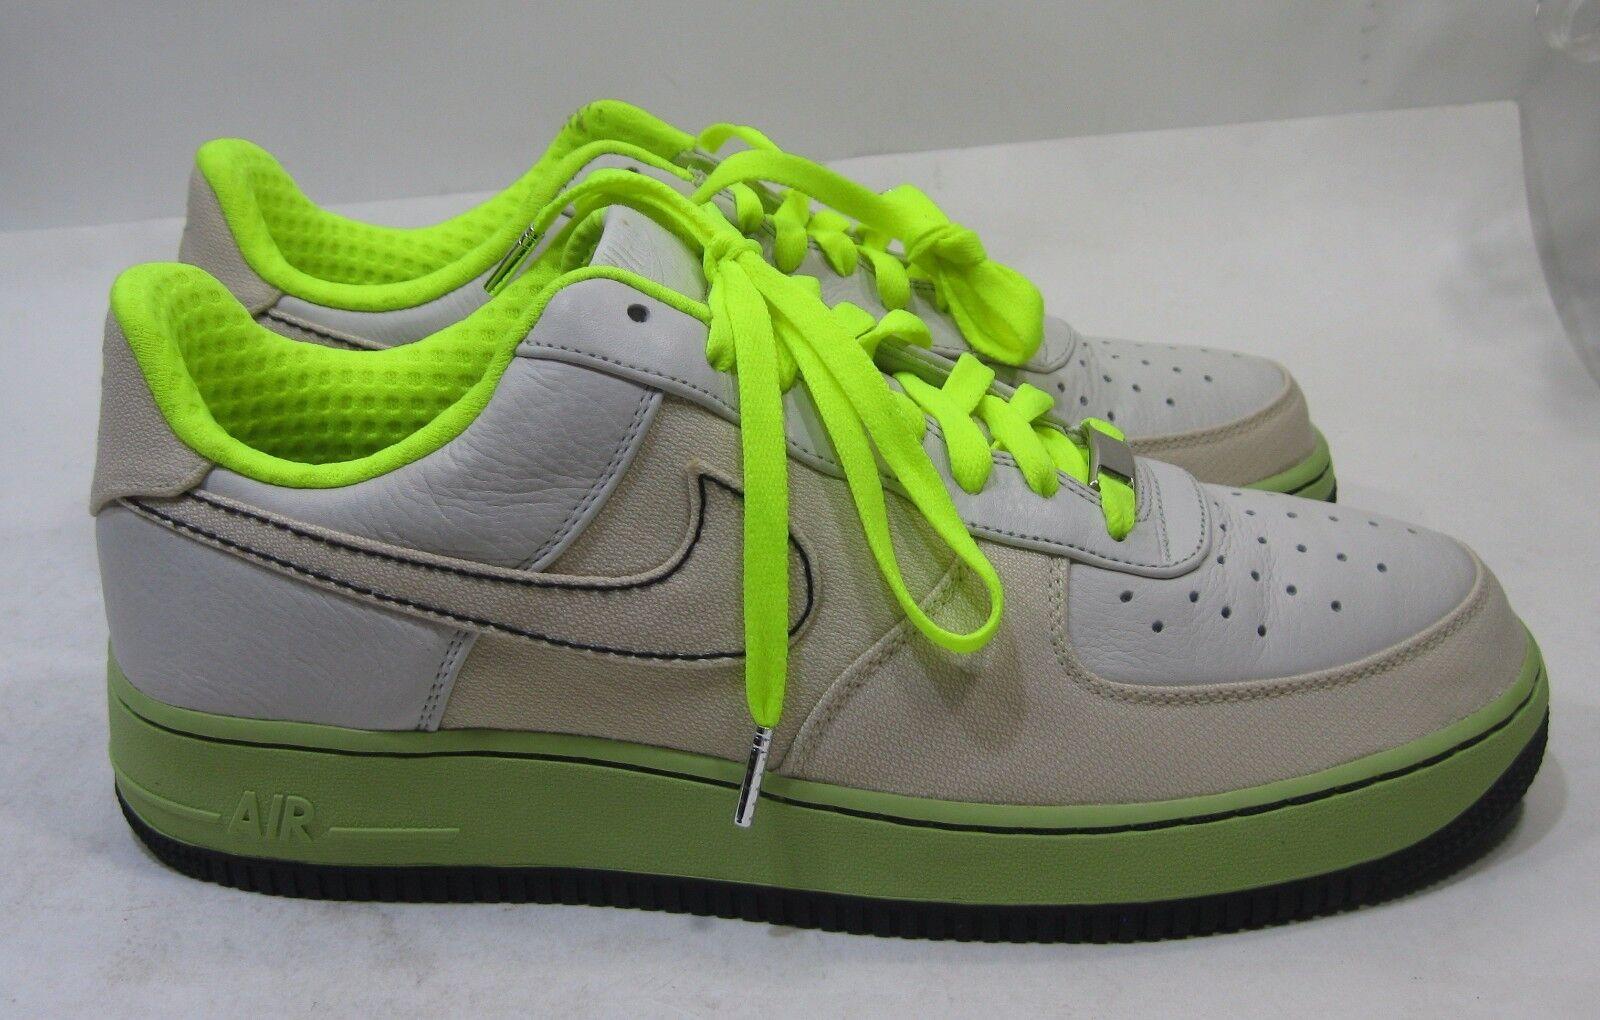 New Nike Air Force premium 07 [315180-002] New Tgoldnto Bone Volt Size 11